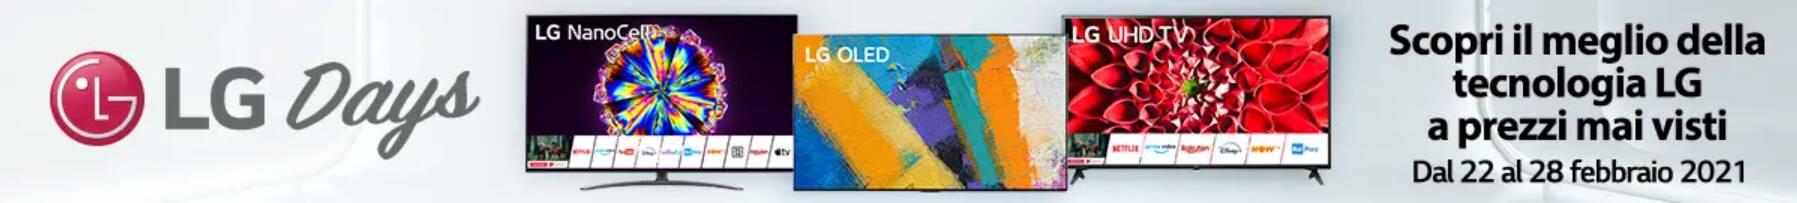 Banner LG Days